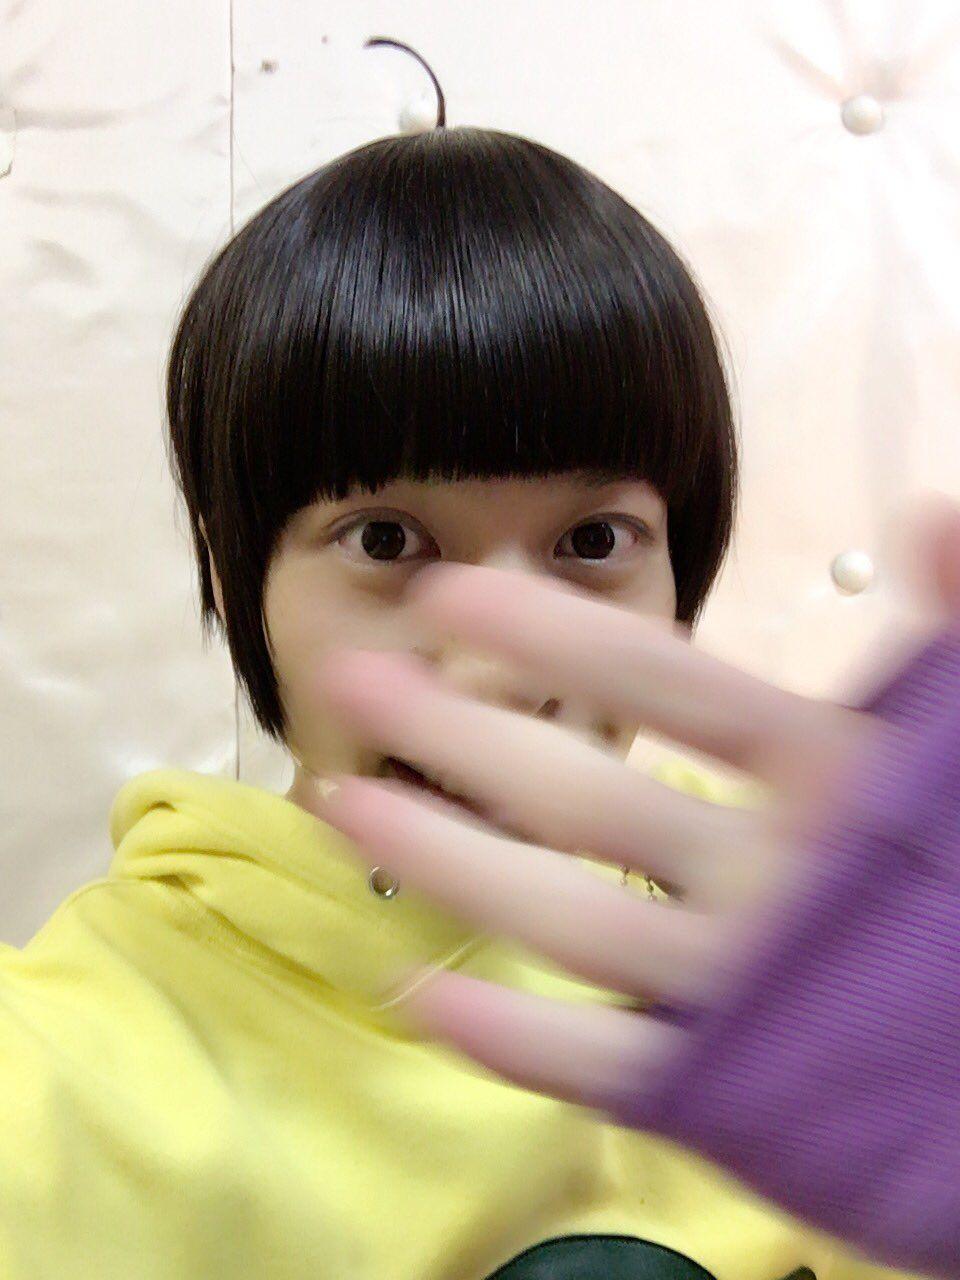 小澤廉 on | Twitter